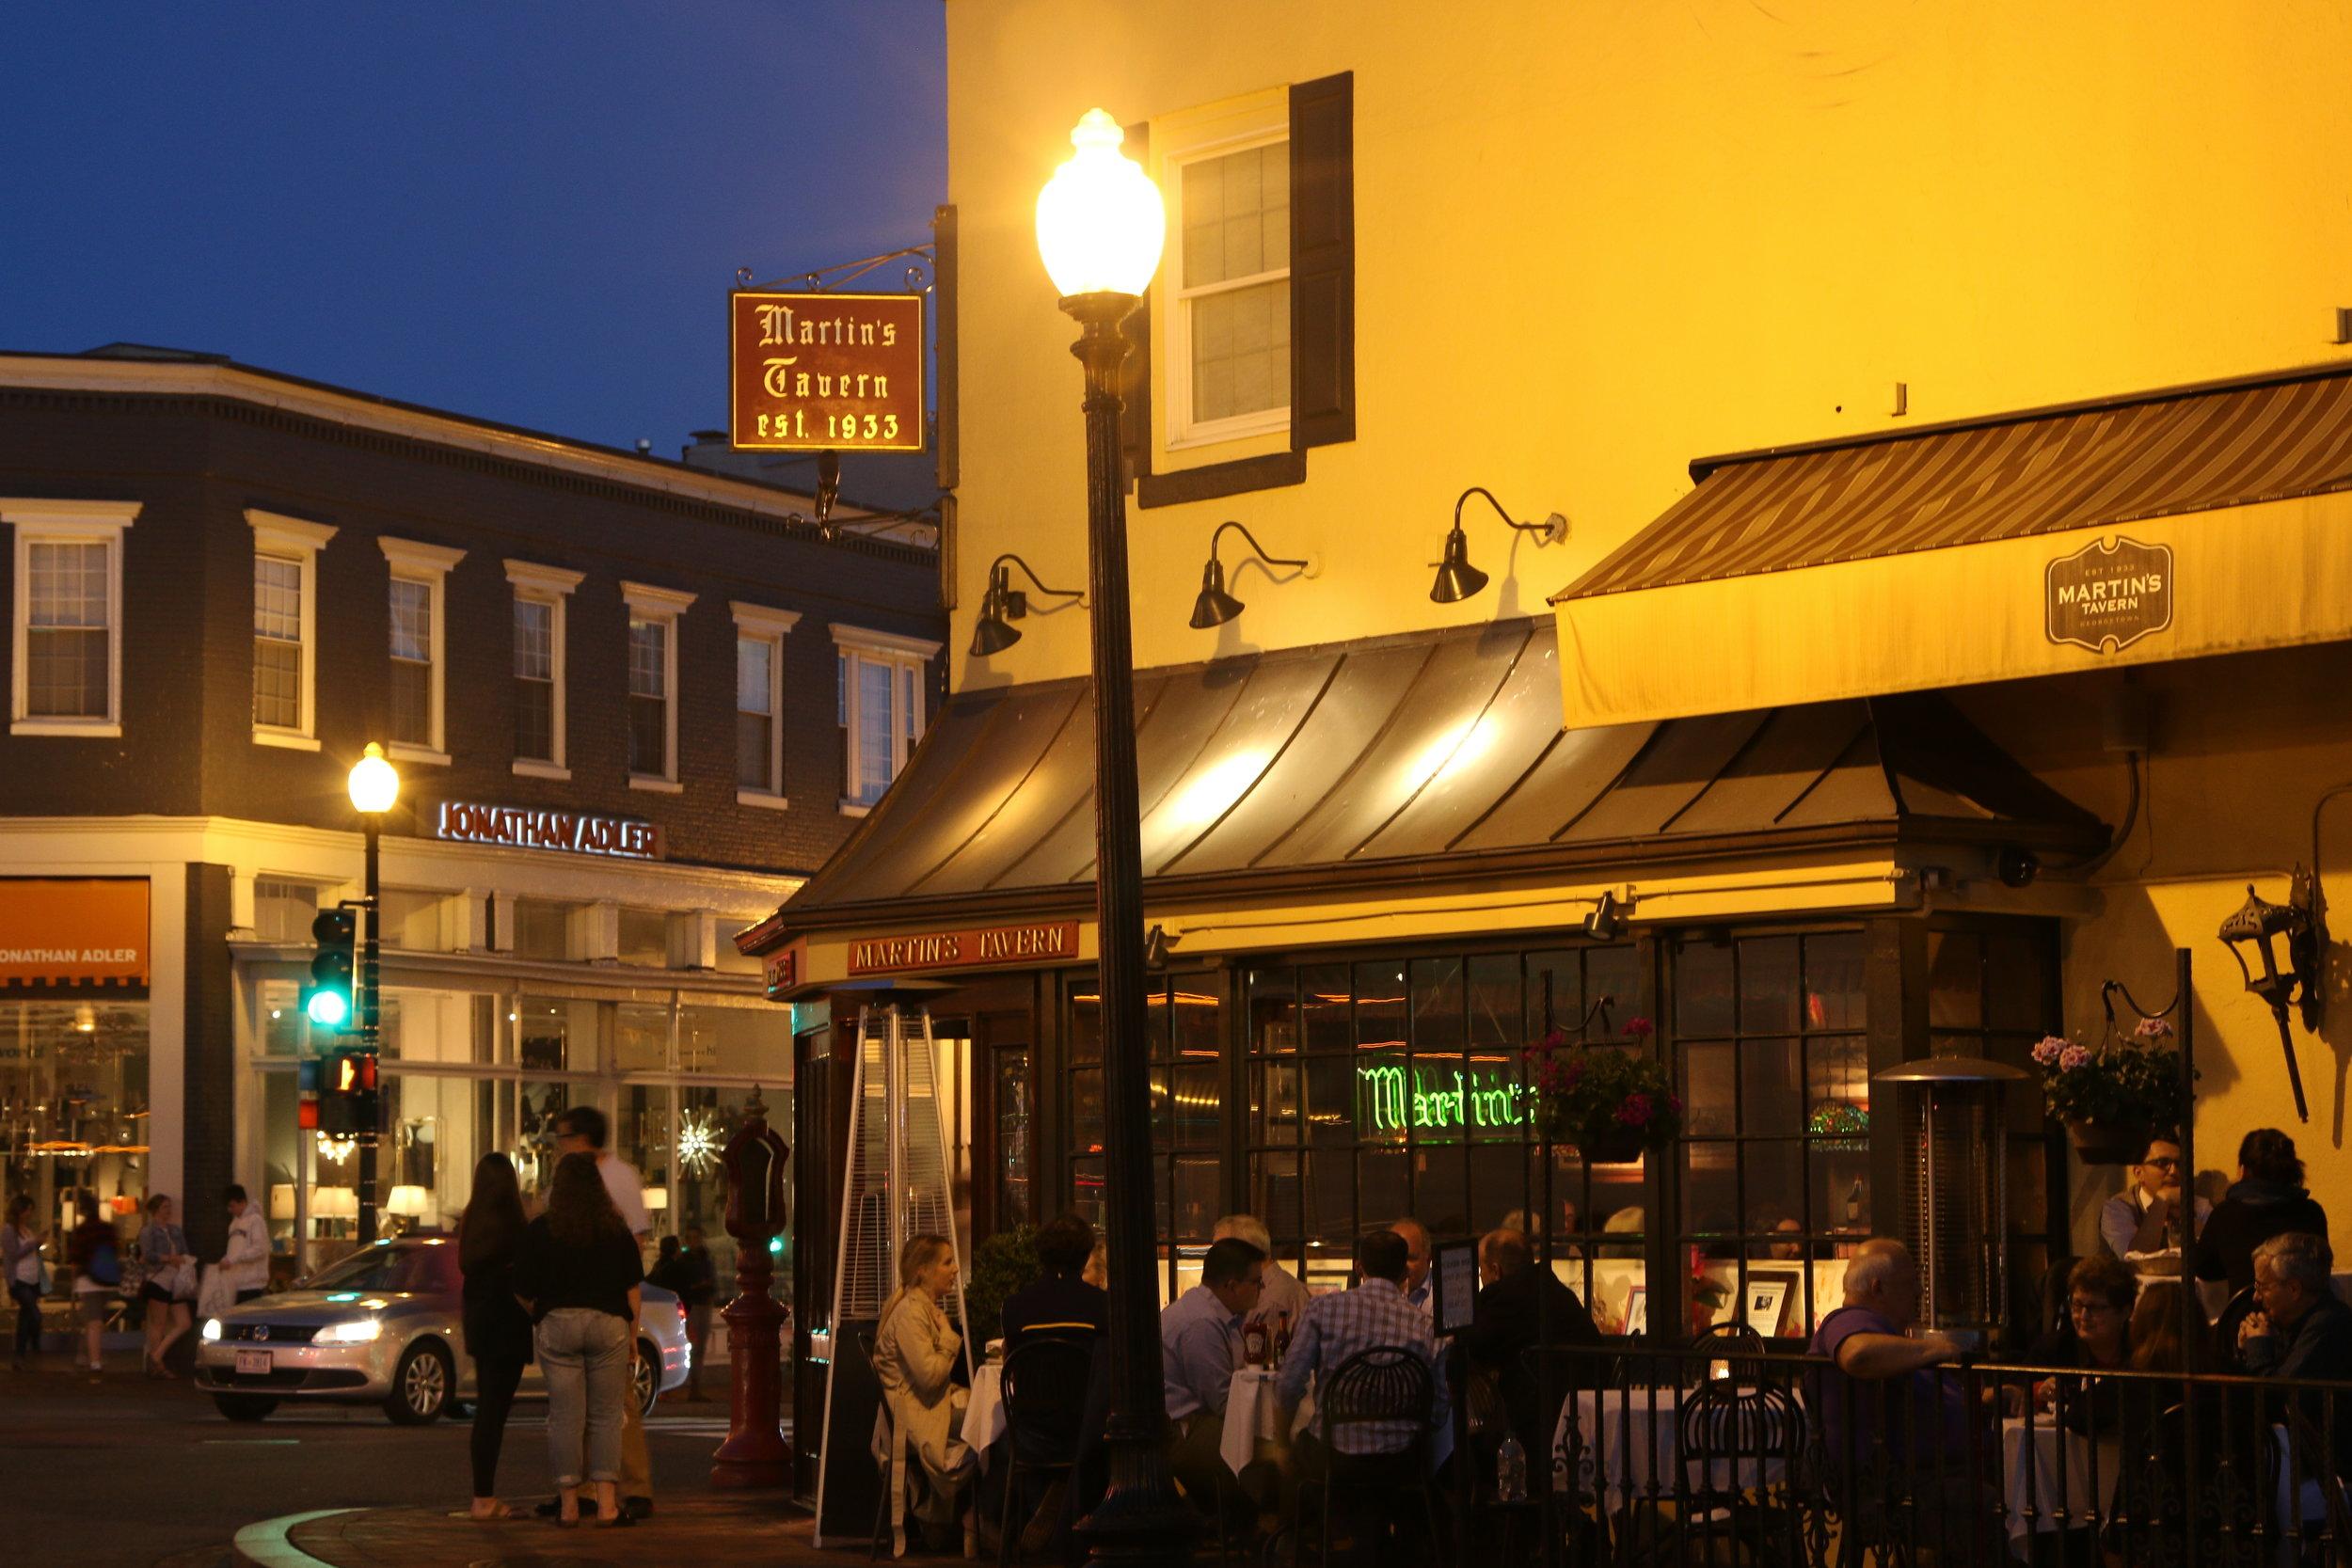 Martin's Tavern in D.C.